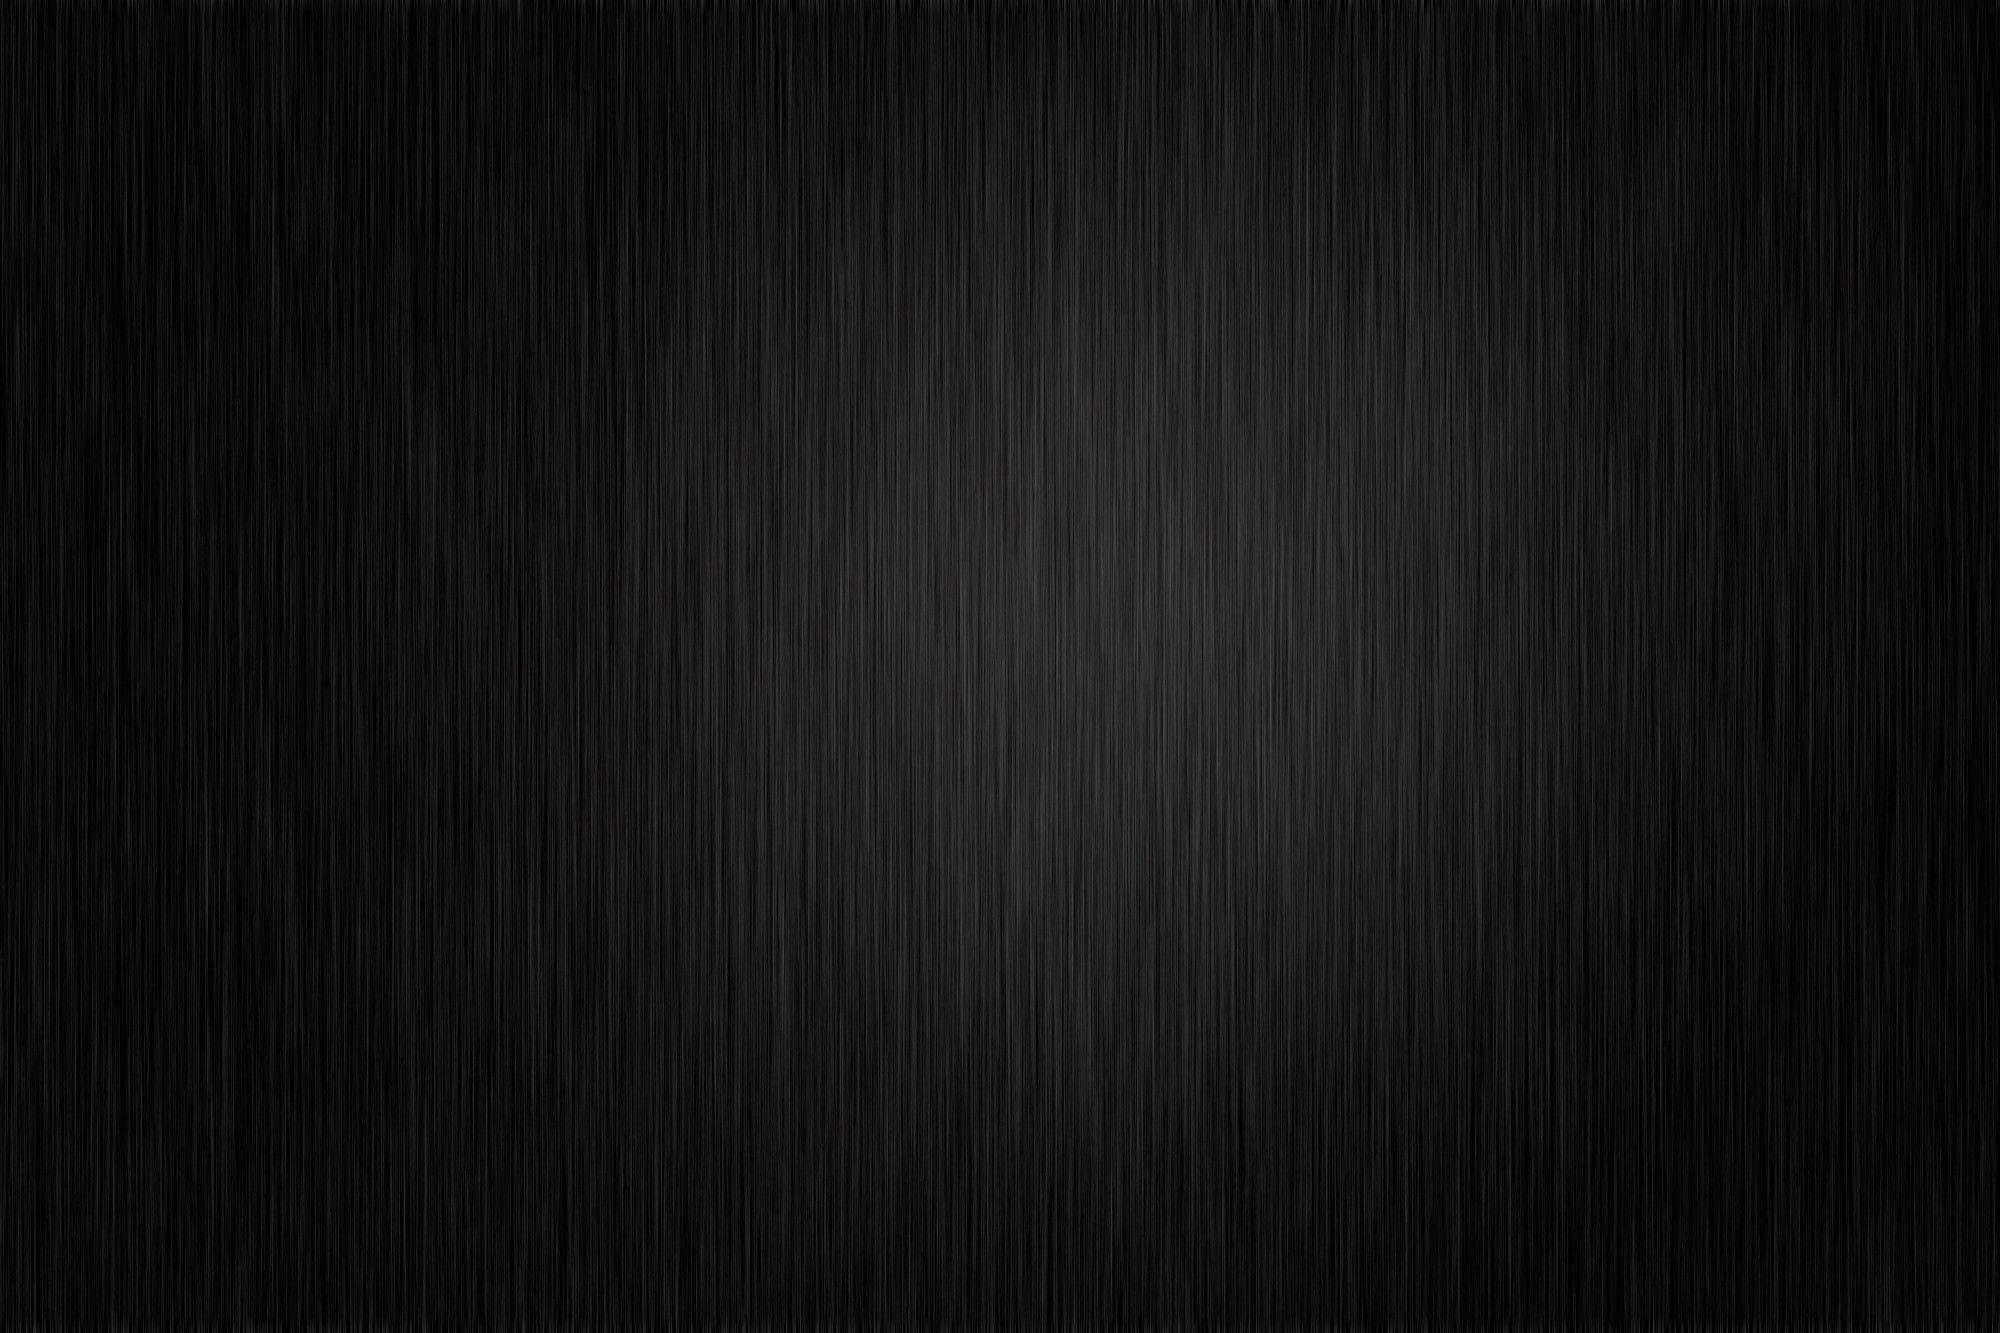 1920x1200 10 black wallpapers free jpg png psd format download design